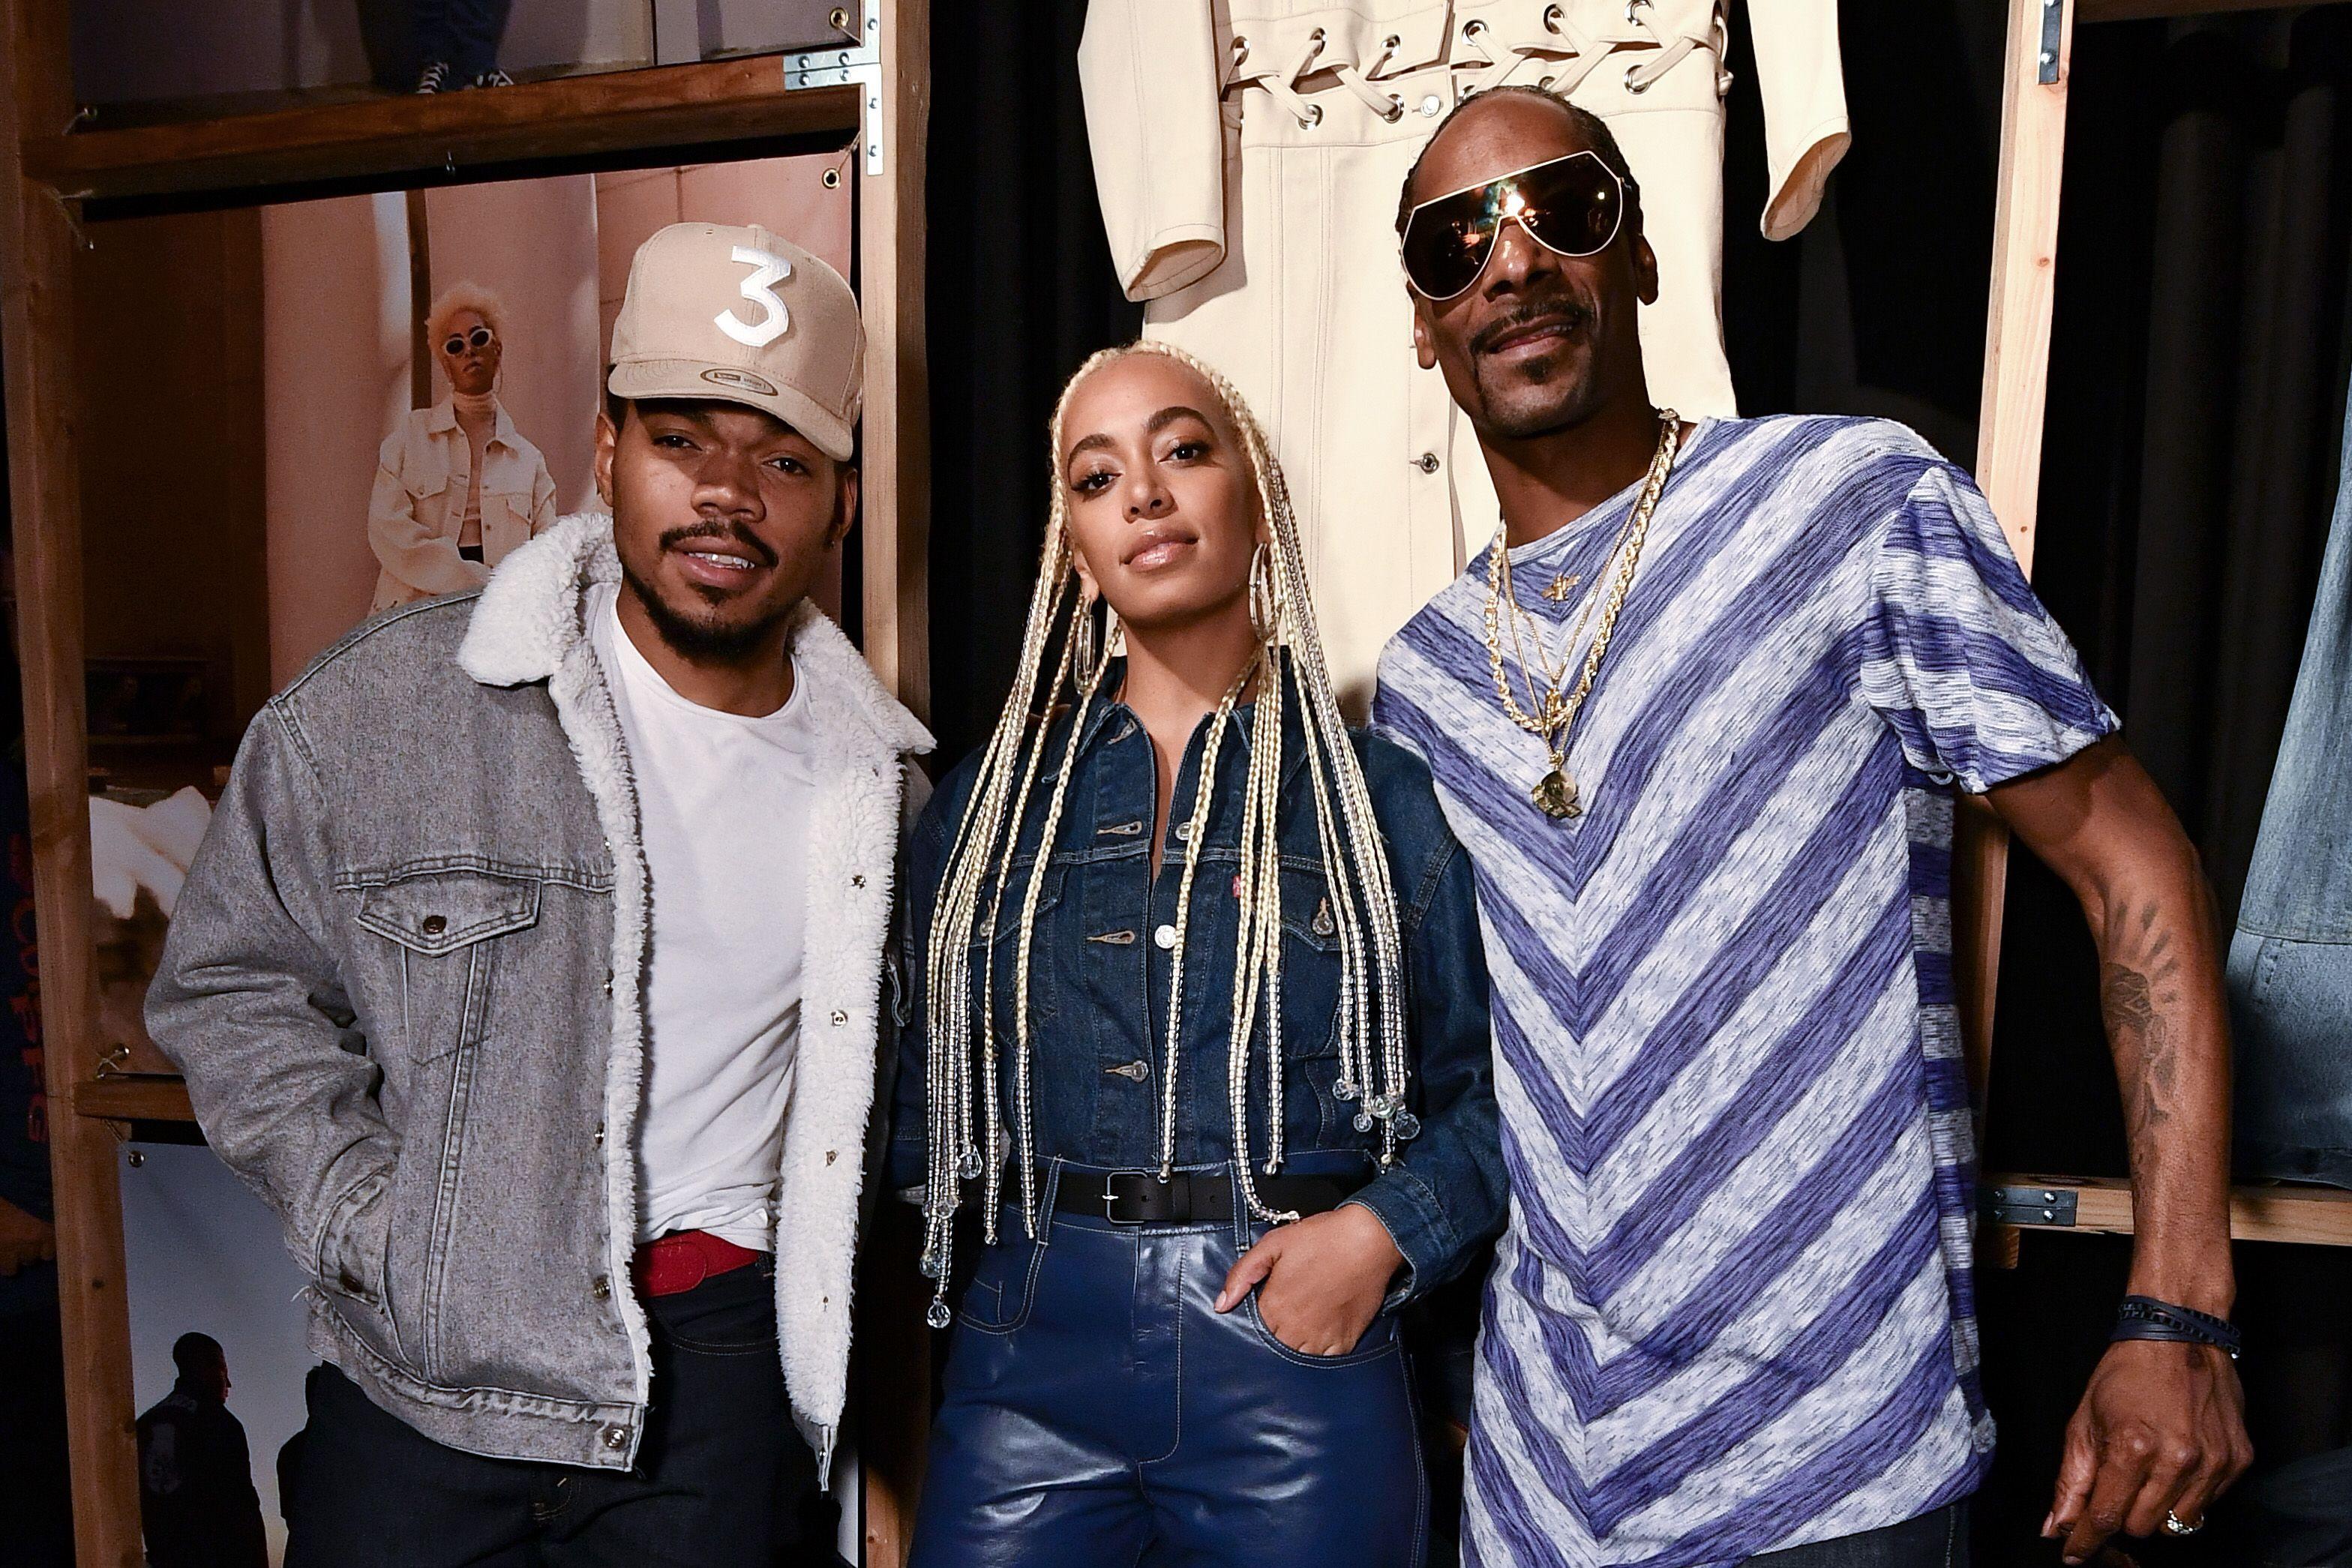 Chance The Rapper, Solange Knowles e Snoop Dogg na festa dos 50 anos da Trucker Jacket em LA / Foto: Shutterstock